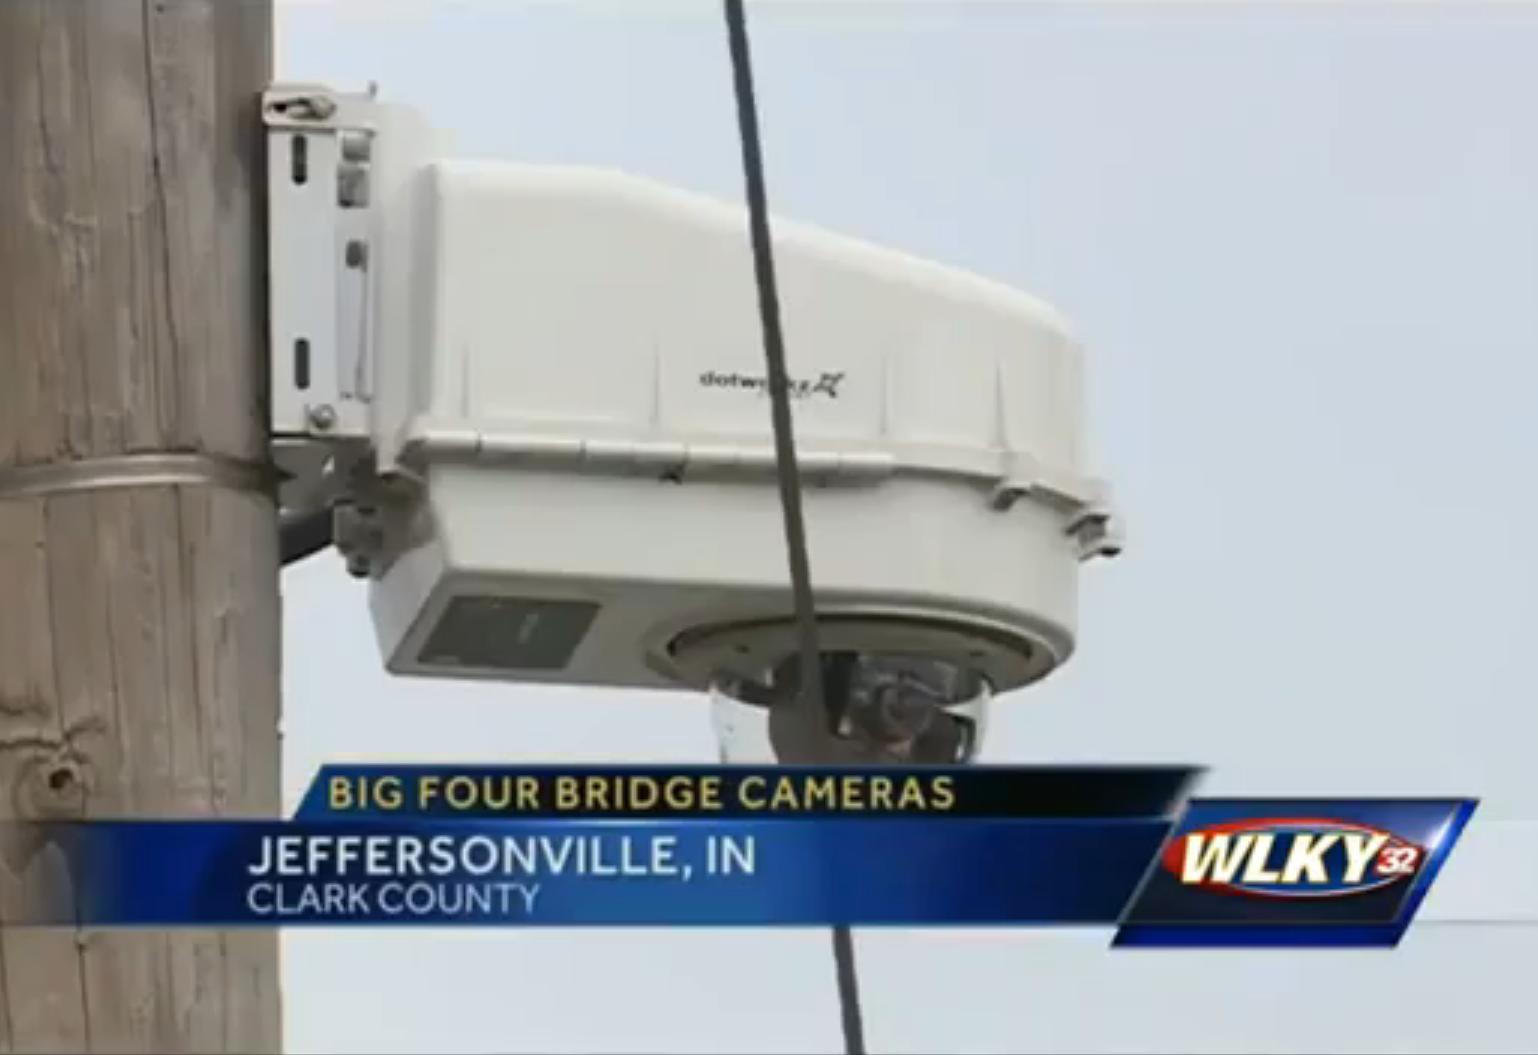 Big 4 Bridge, Jeffersonville, Indiana